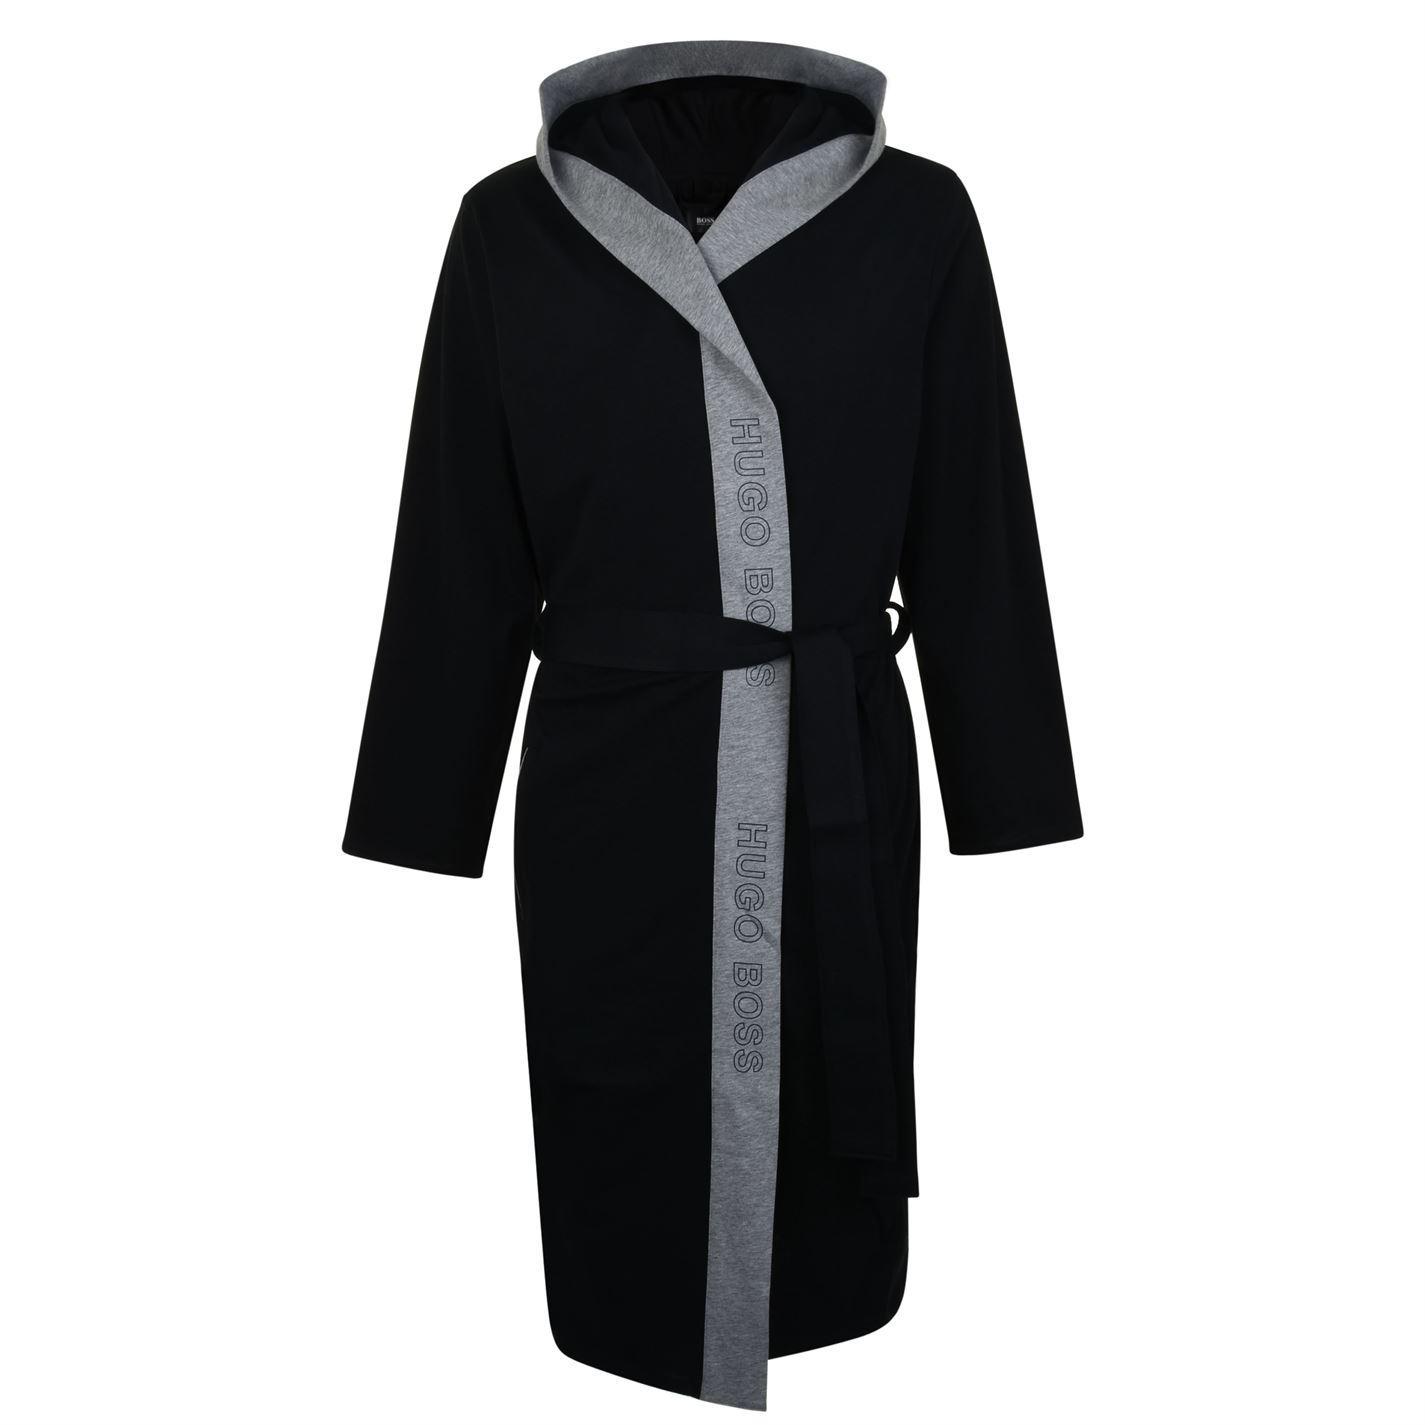 d8e0d1b37f BOSS by Hugo Boss Identity Dressing Gown in Black for Men - Lyst